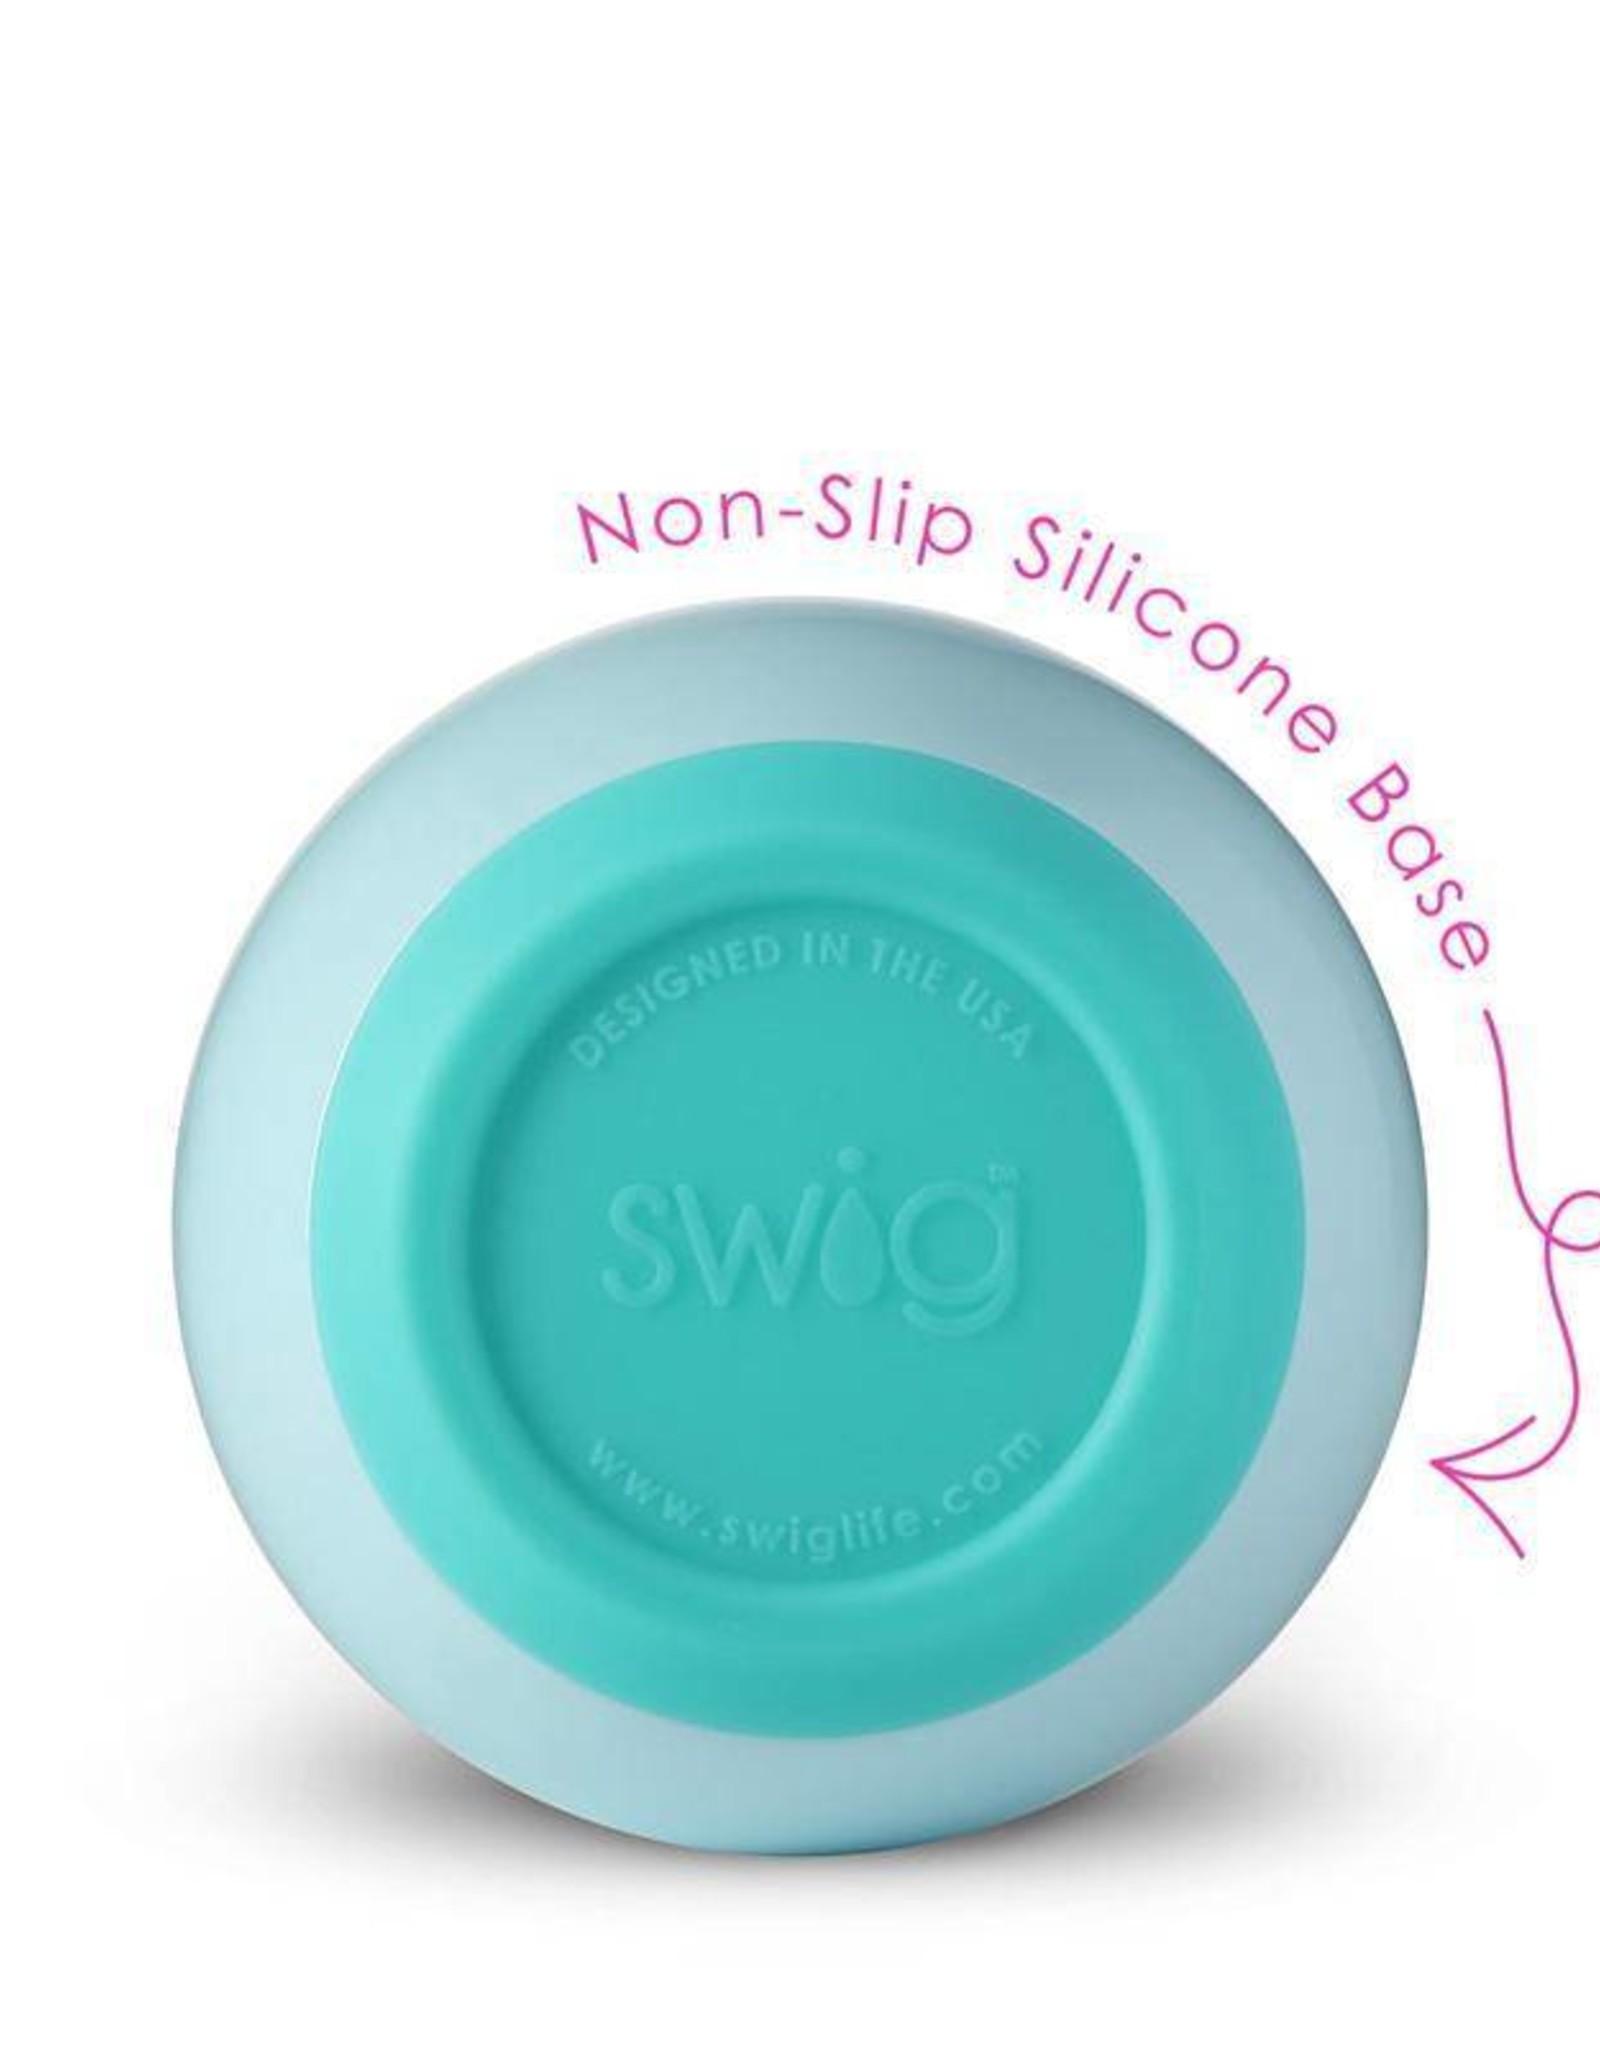 Swig 14oz stemless wine- blush